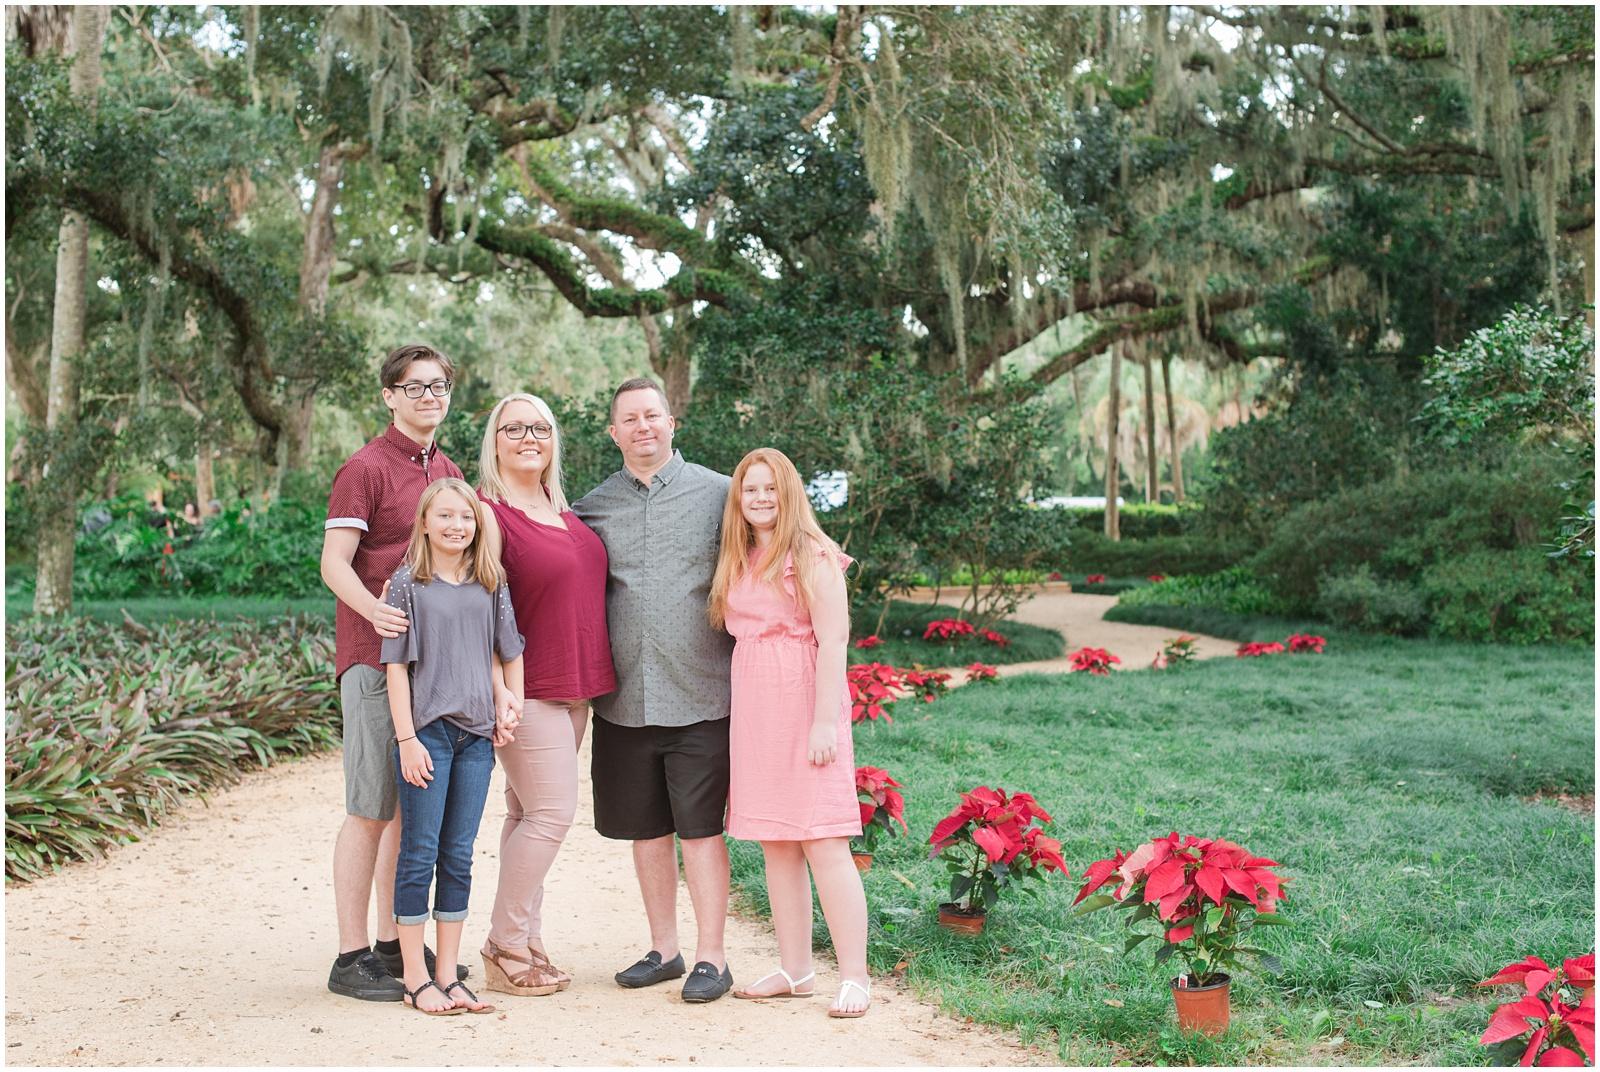 Washington Oaks_Garden_State Park_Beach_Family_Portraits_1.jpg